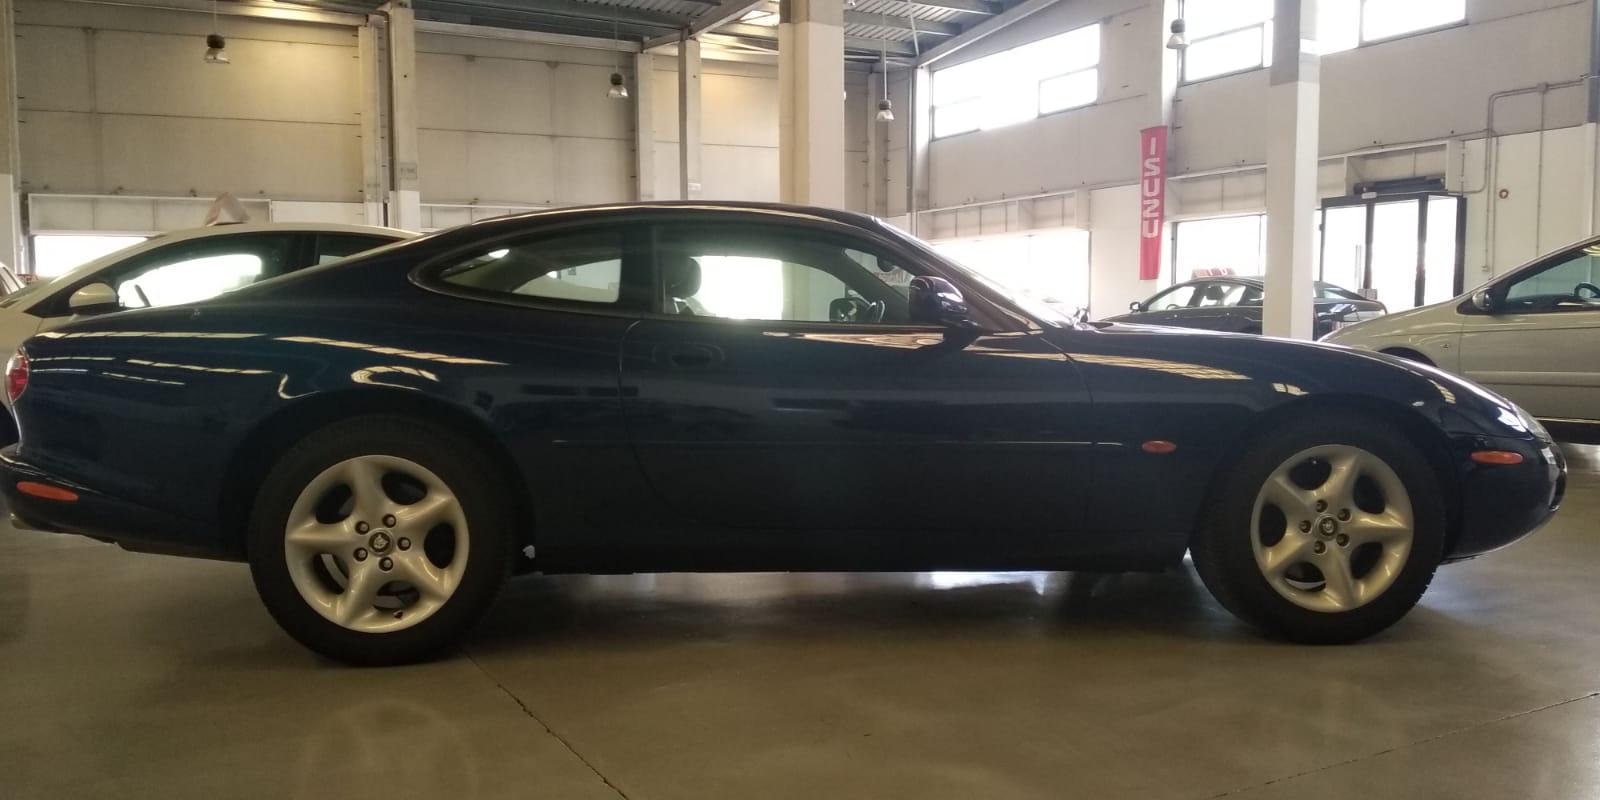 JaguarXK8_HiperautoDany_4